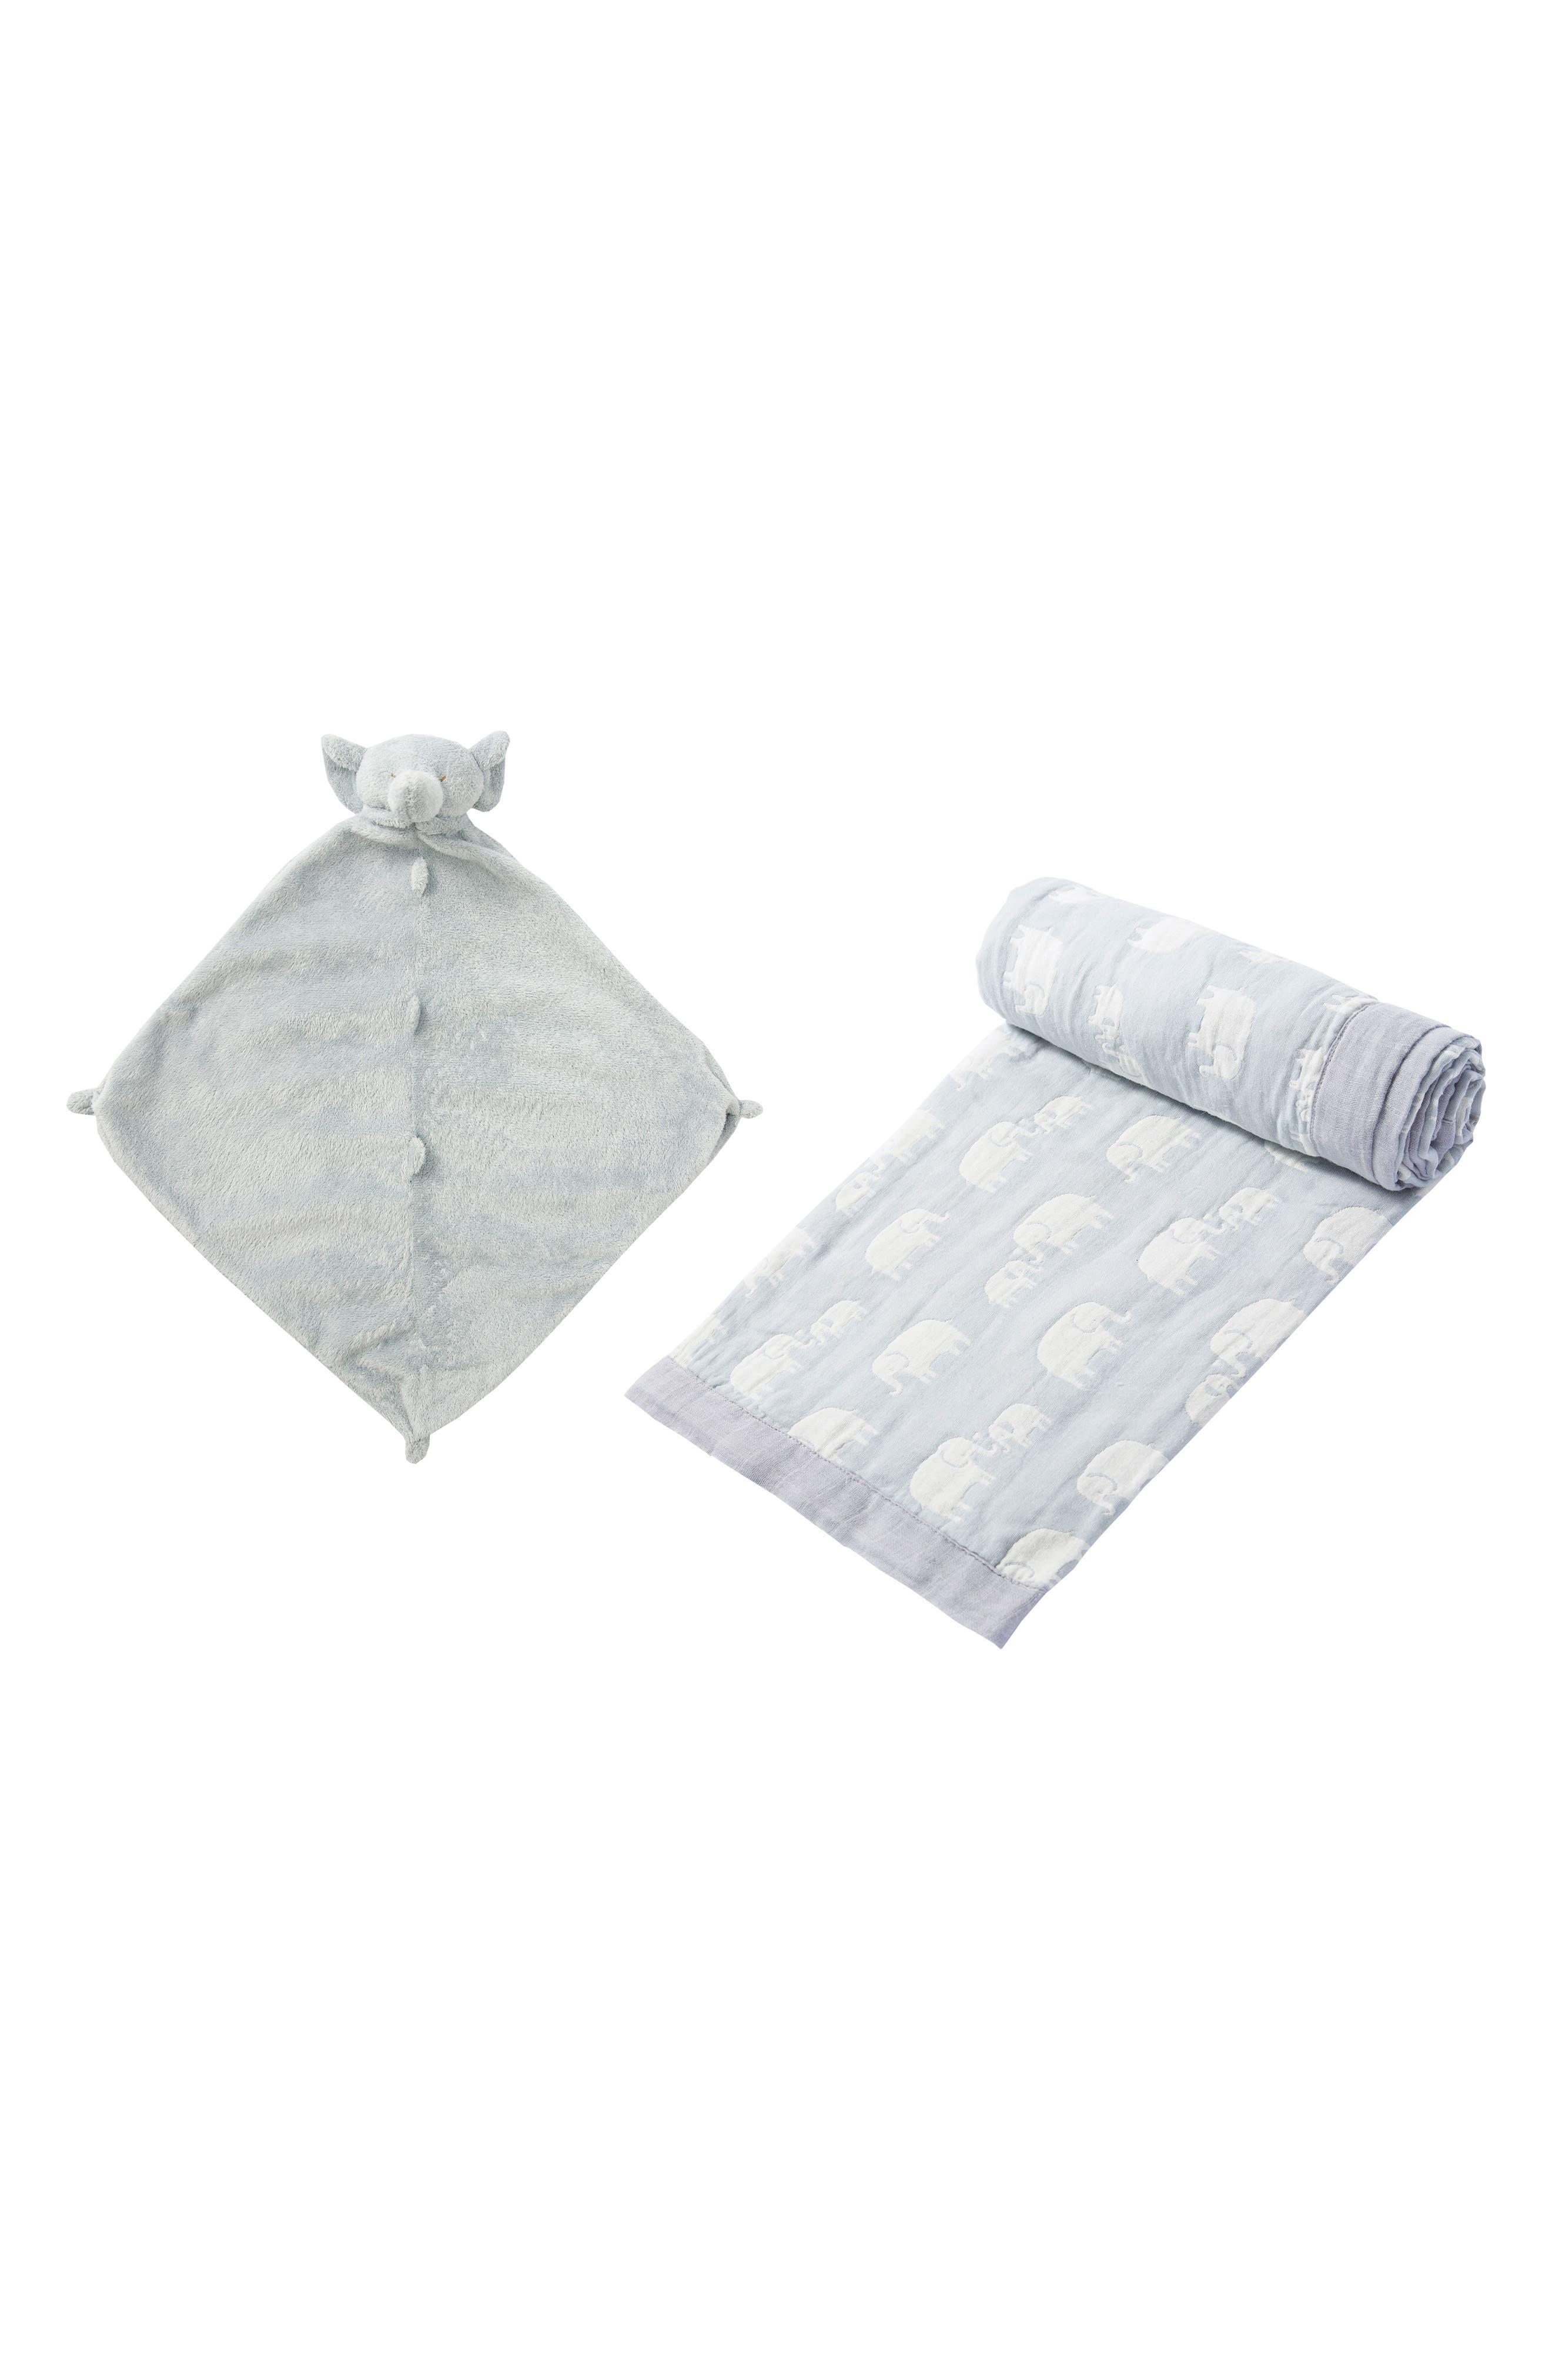 Jacquard Blanket & Blankie Set,                         Main,                         color, Elephant